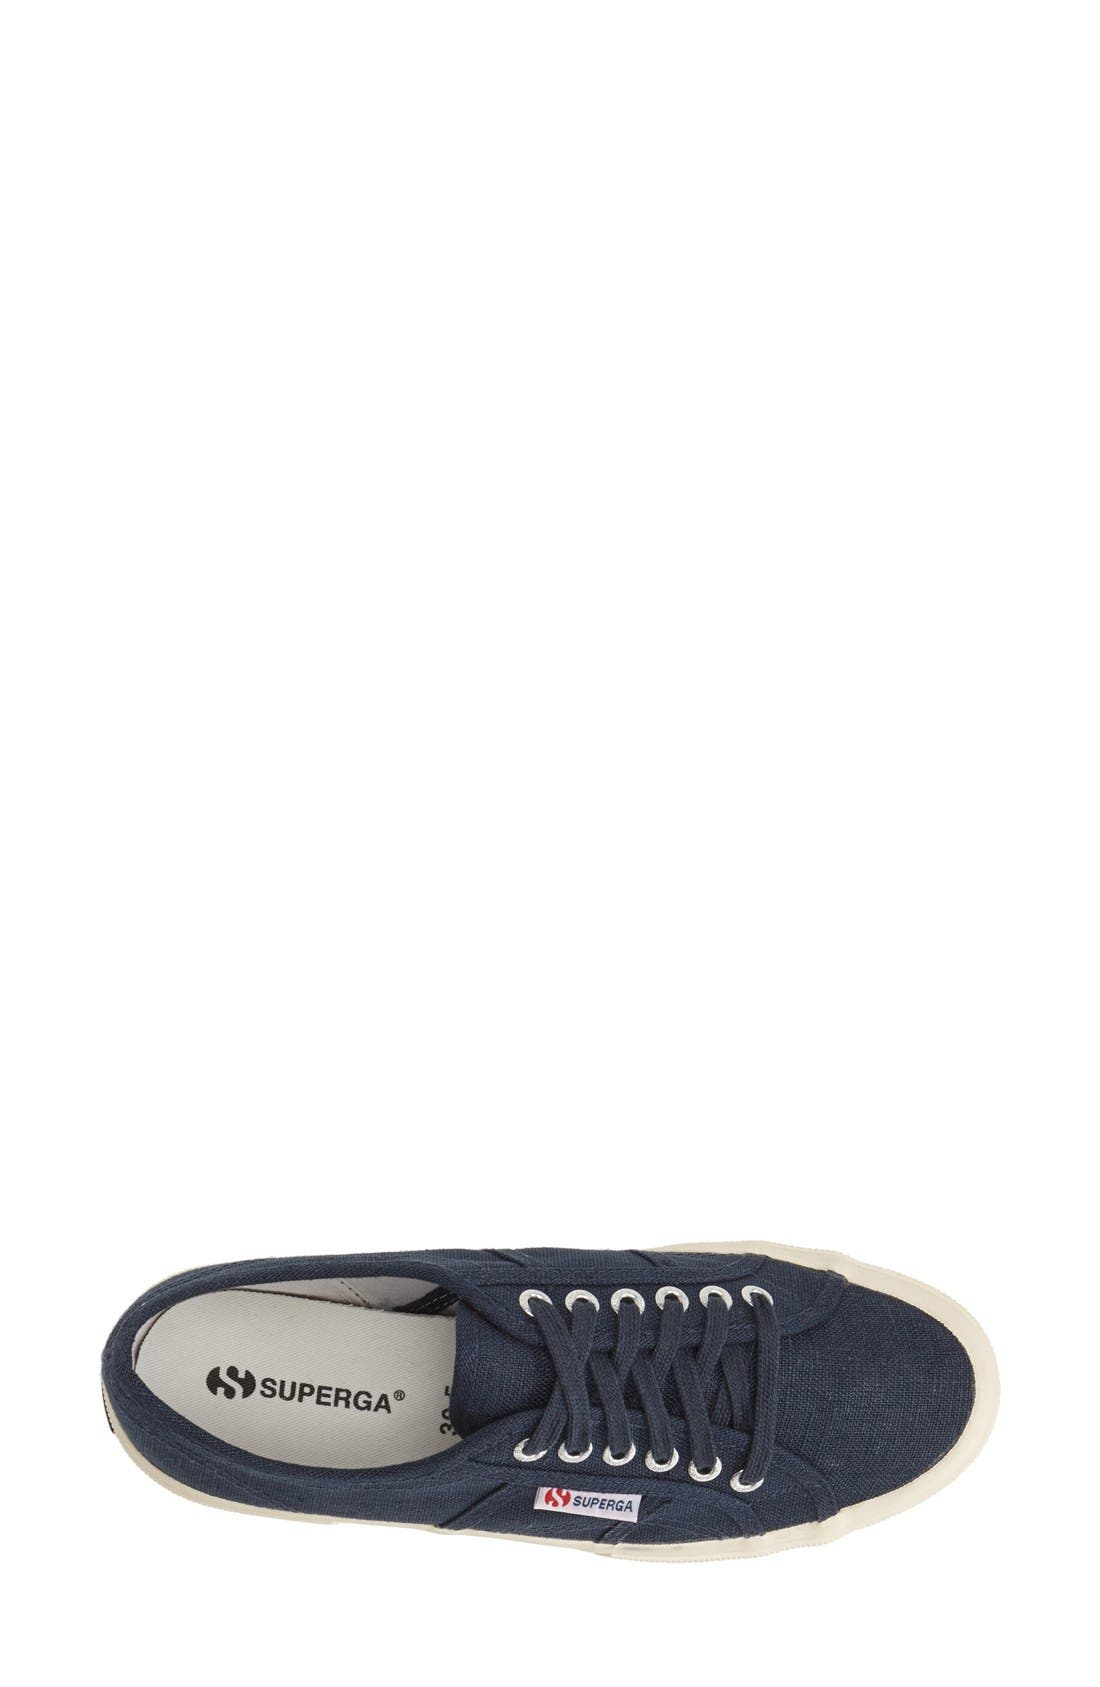 Alternate Image 3  - Superga 'Linu' Linen Sneaker (Women)